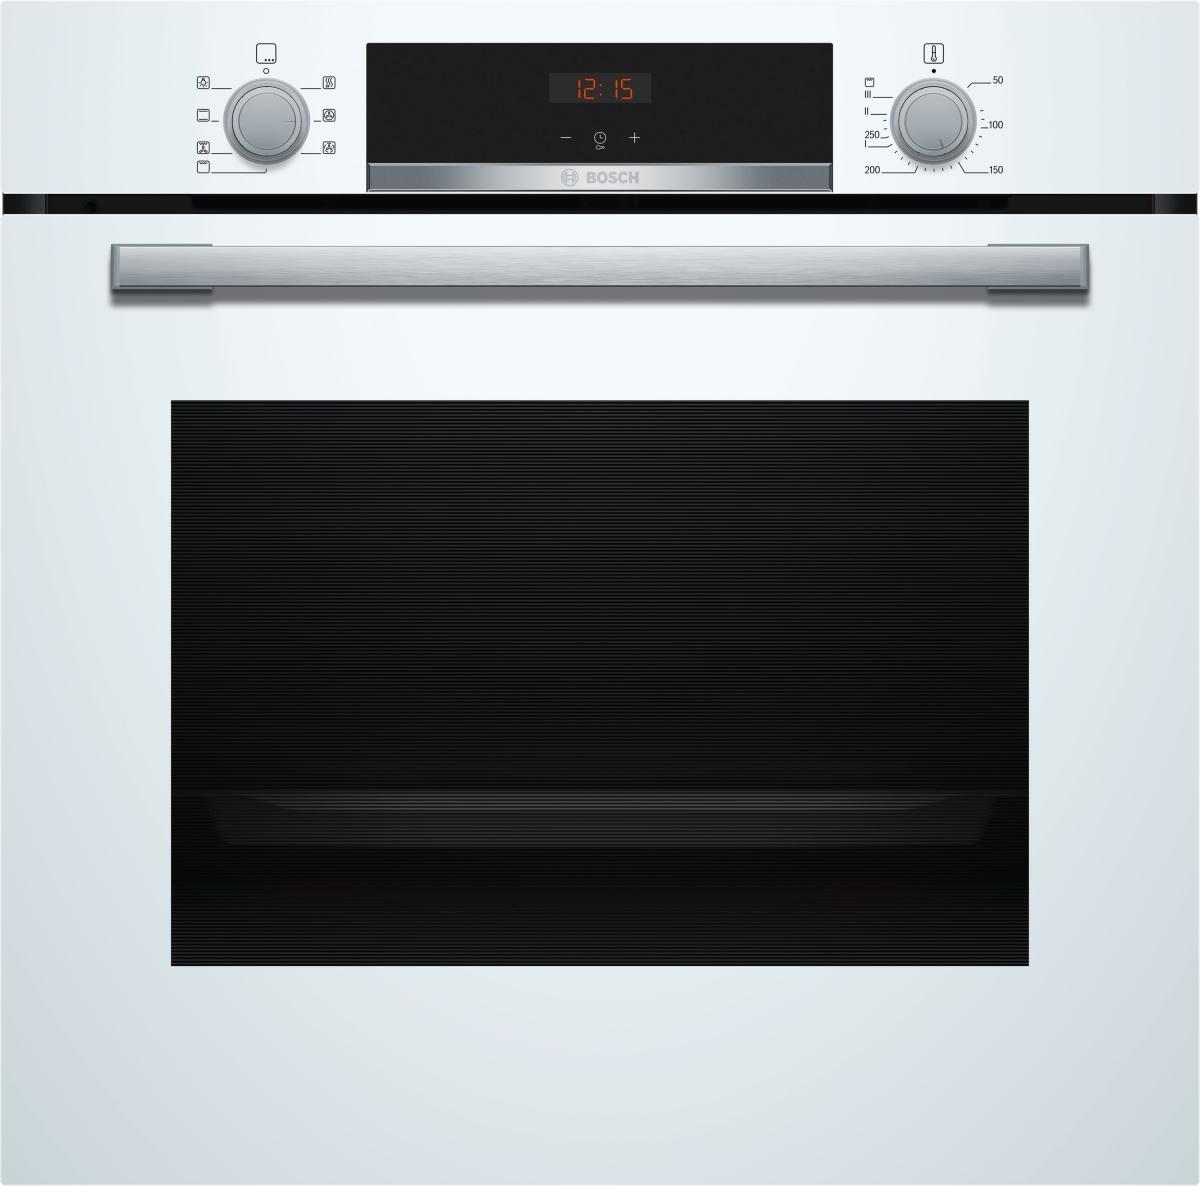 Bosch HBA533BW1 Backofen 60 cm LED-Display5 Heizarten Polar WeißEEK: A